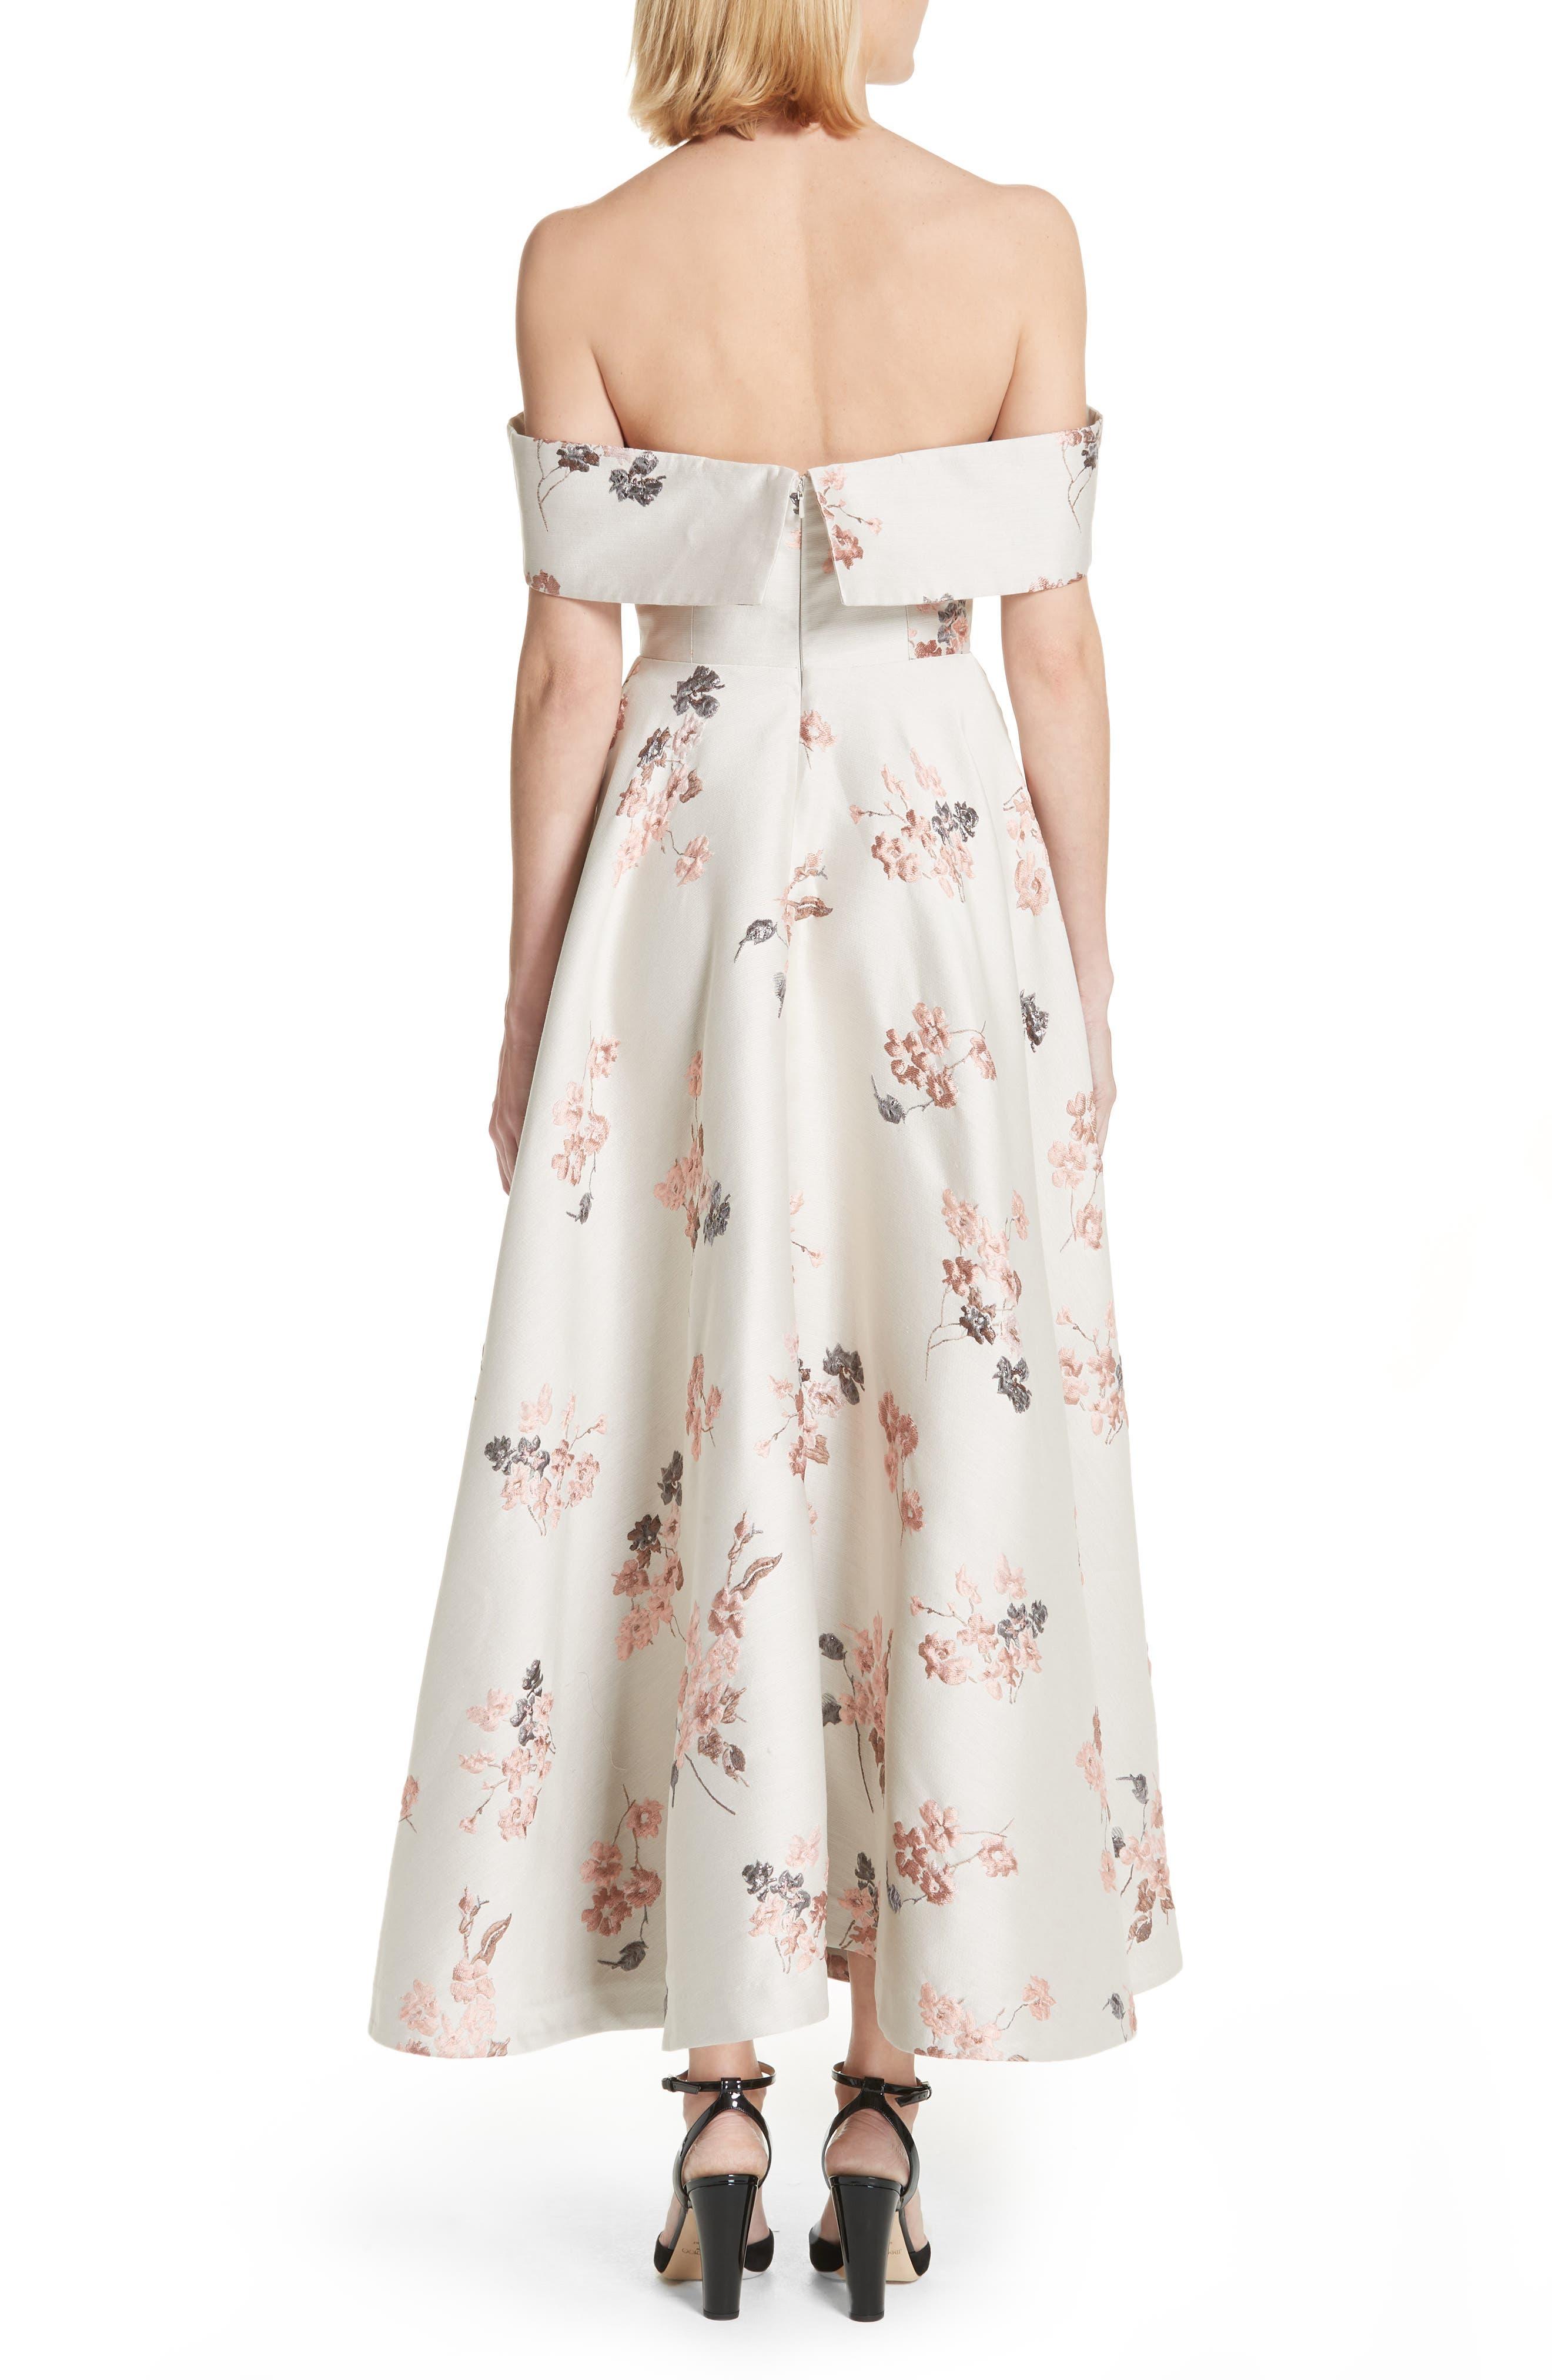 Metallic Floral Jacquard Off the Shoulder Dress,                             Alternate thumbnail 2, color,                             275